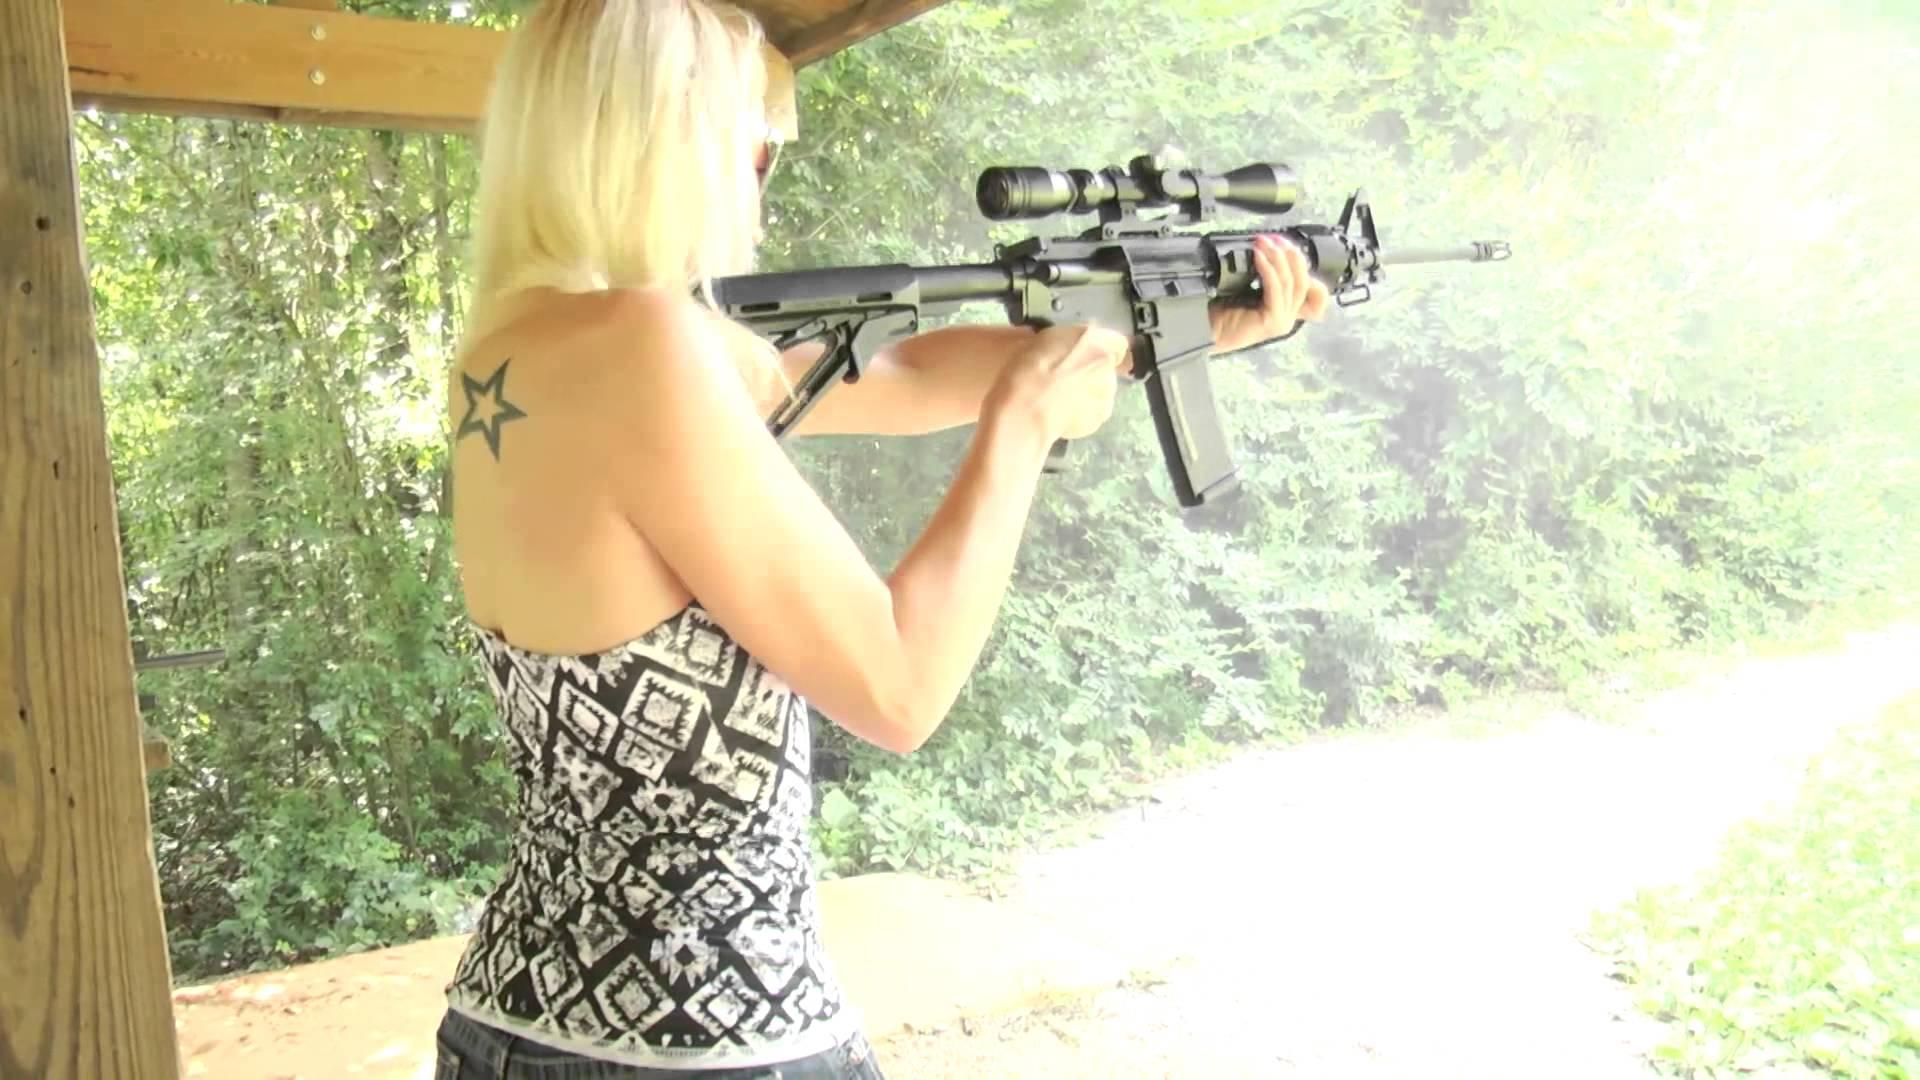 Shannon Shooting a Del-Ton AR-15 Rifle